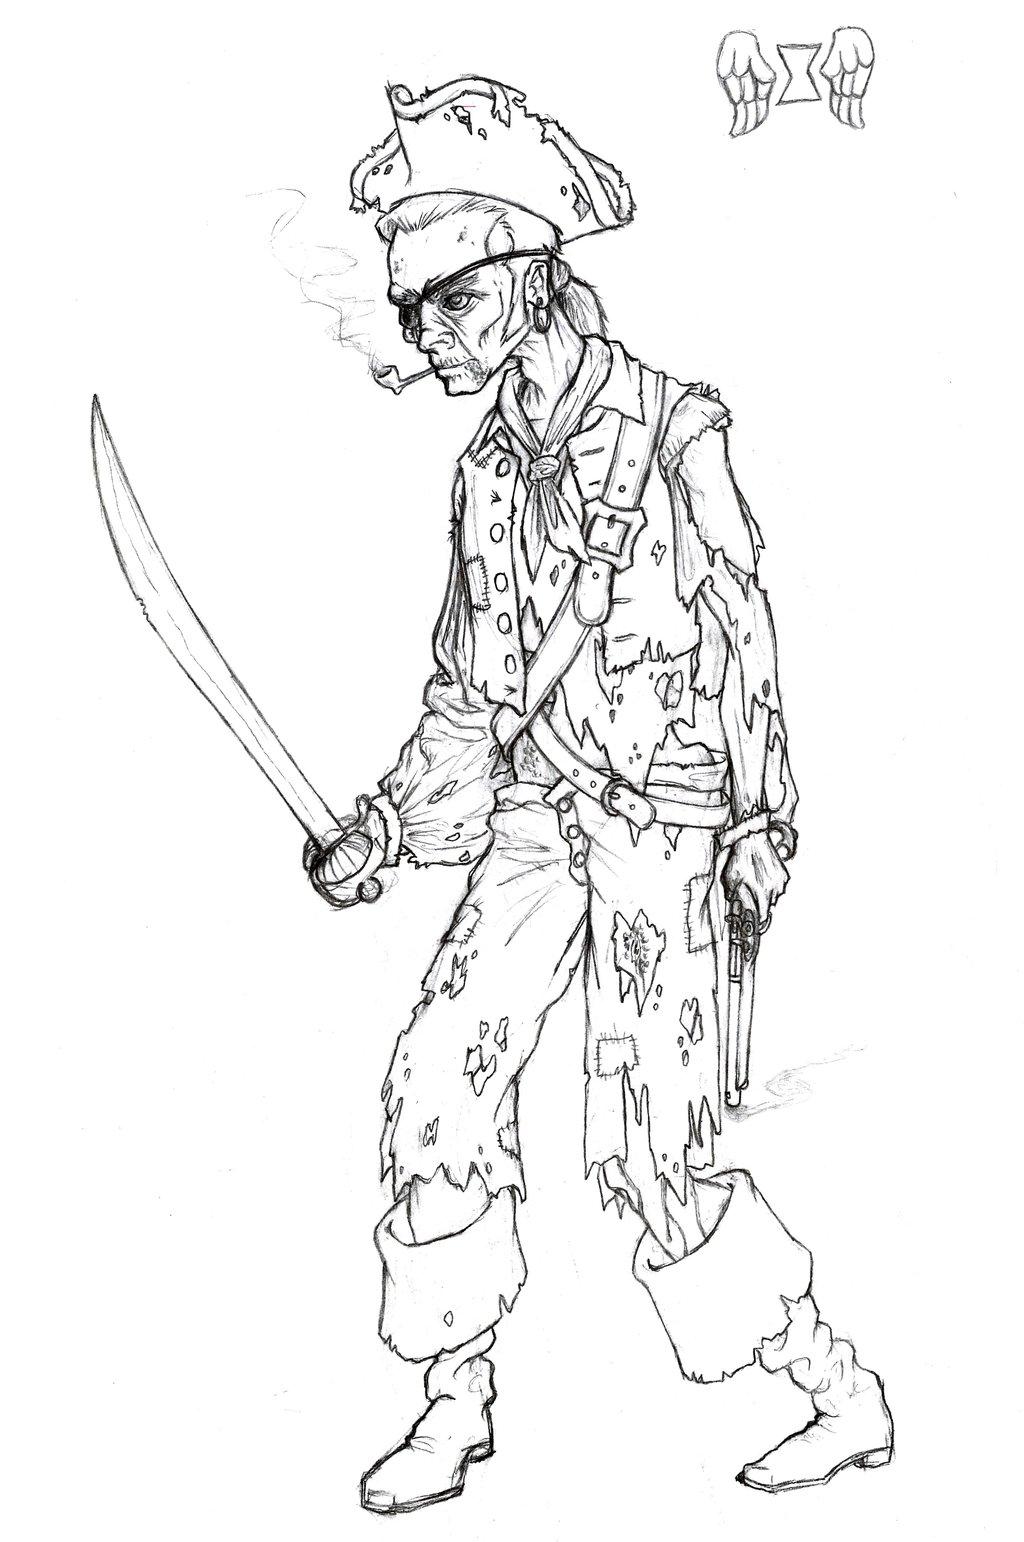 Drawn pirate undead Manveruon Manveruon Pirate by Undead